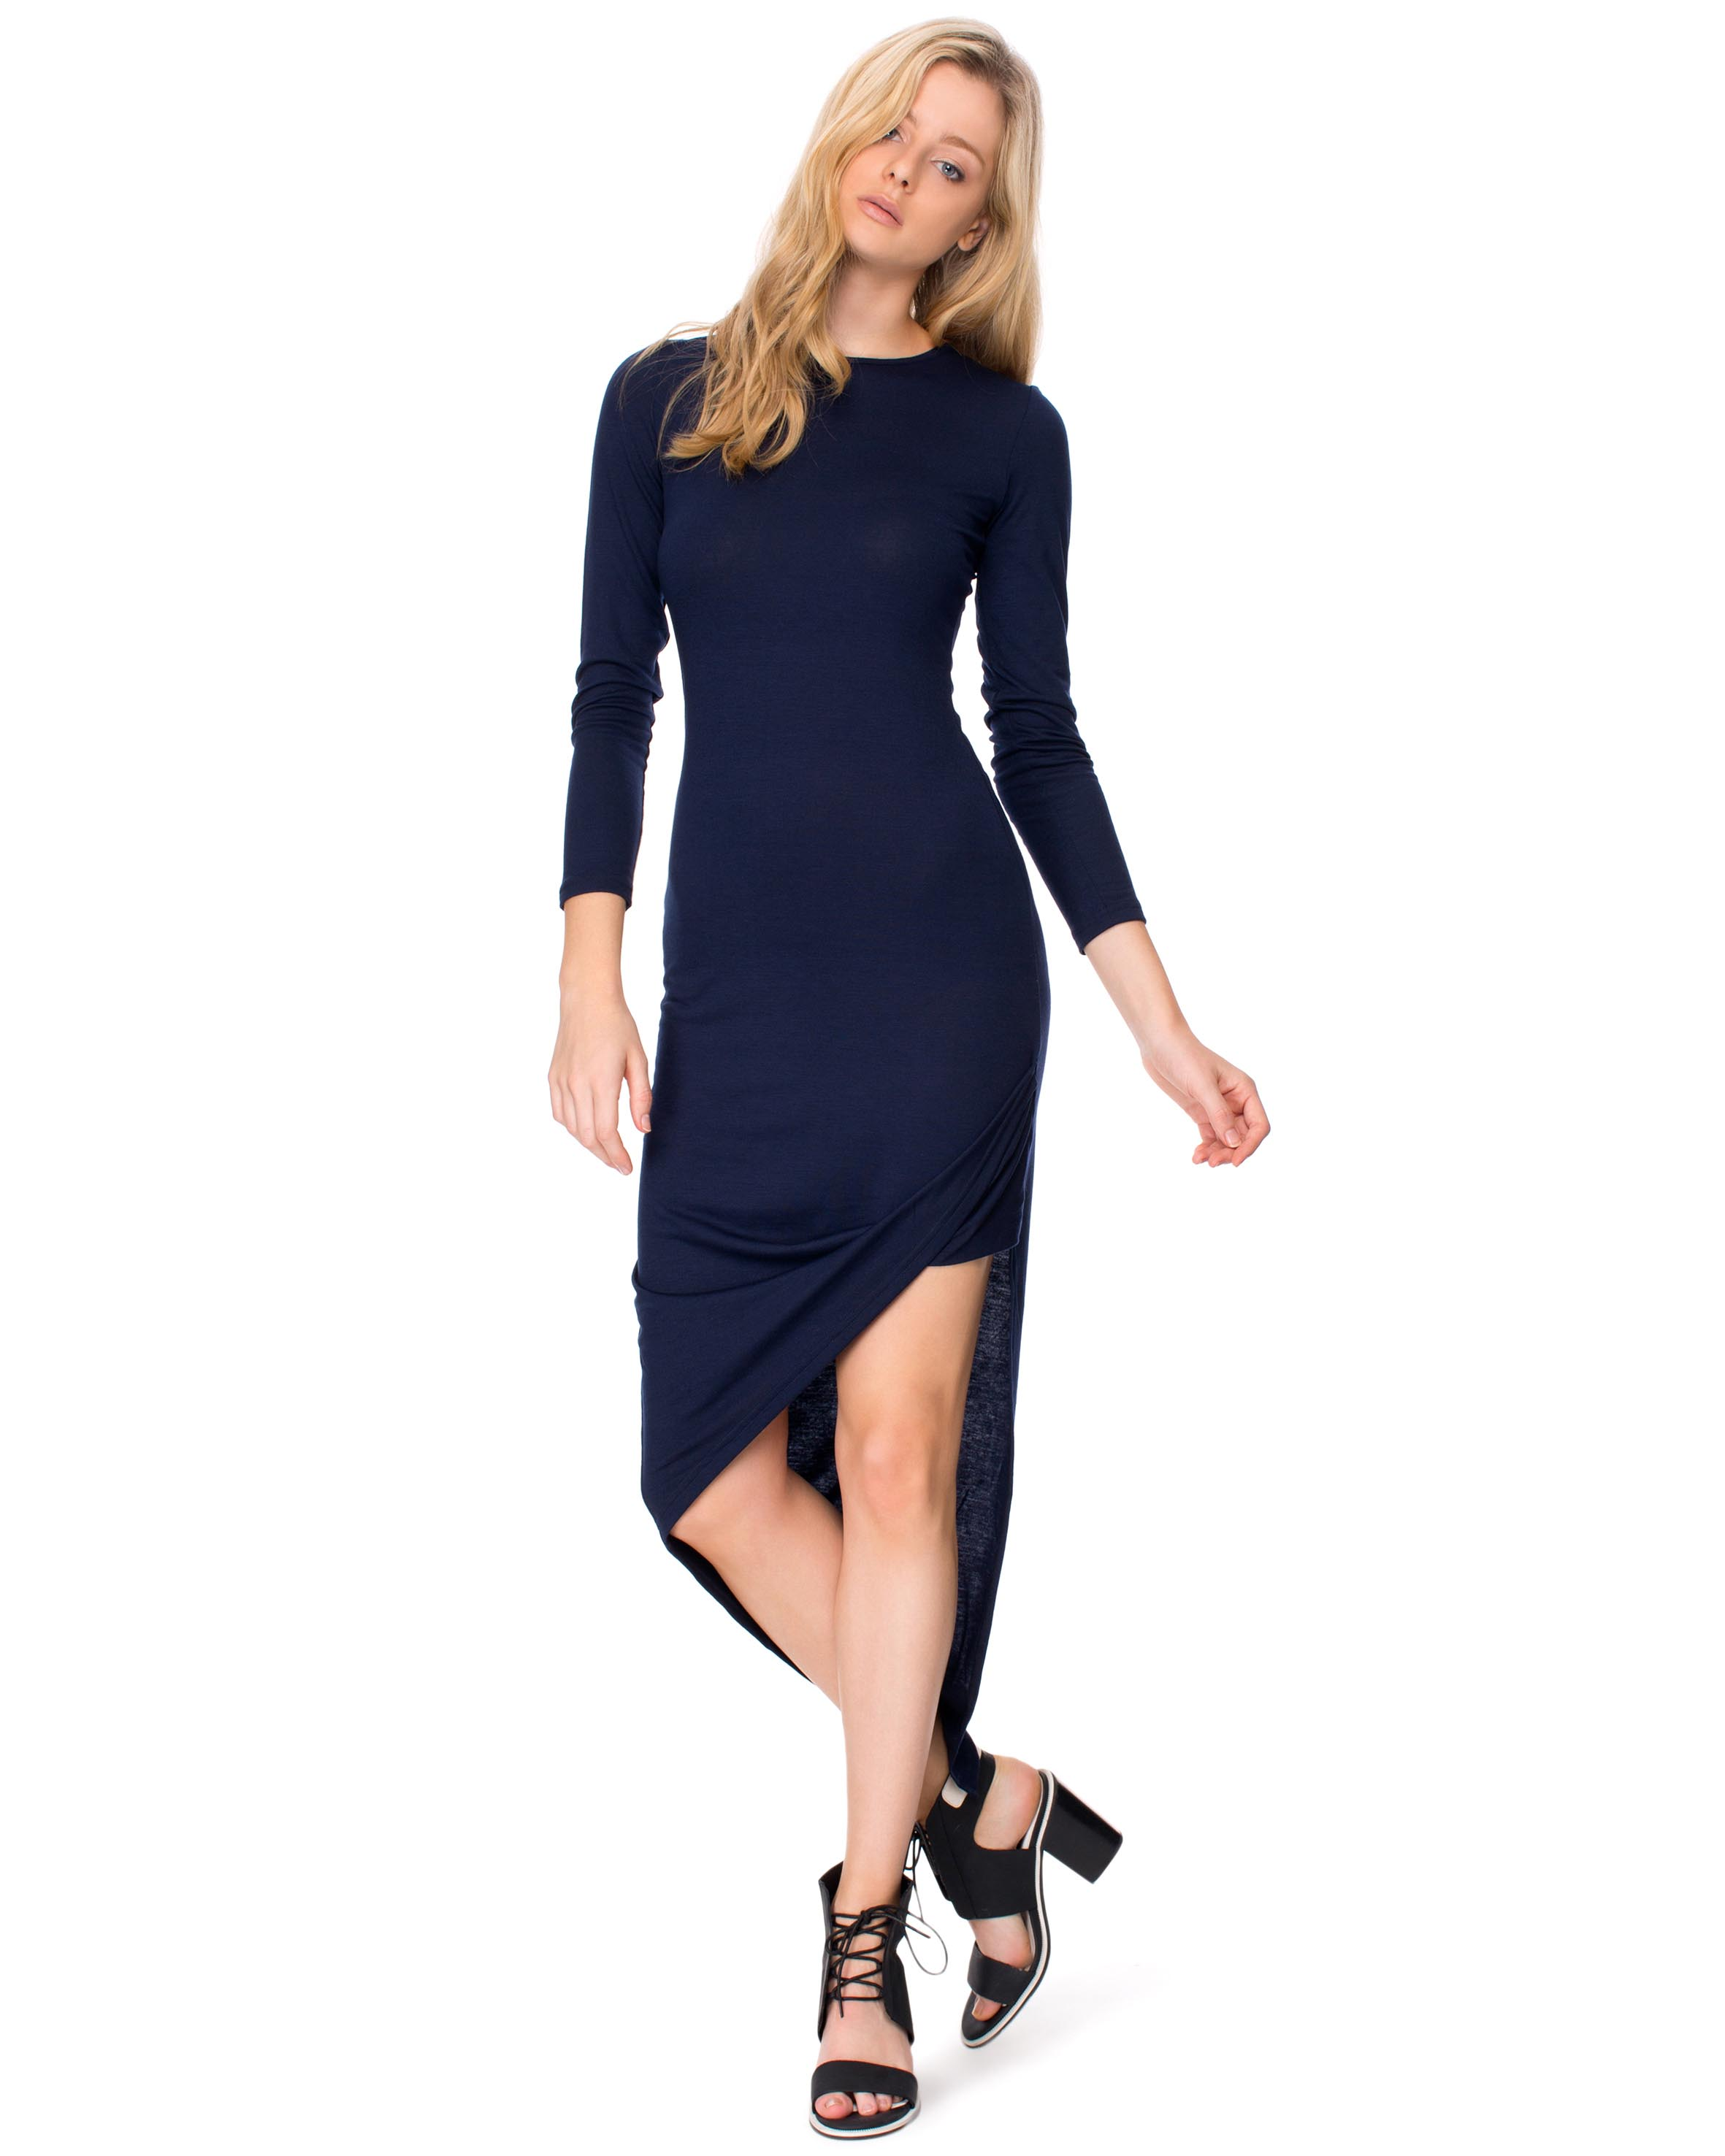 Maxi Dresses Online Wpceugej Maxi Dresses Online Wpceugej s